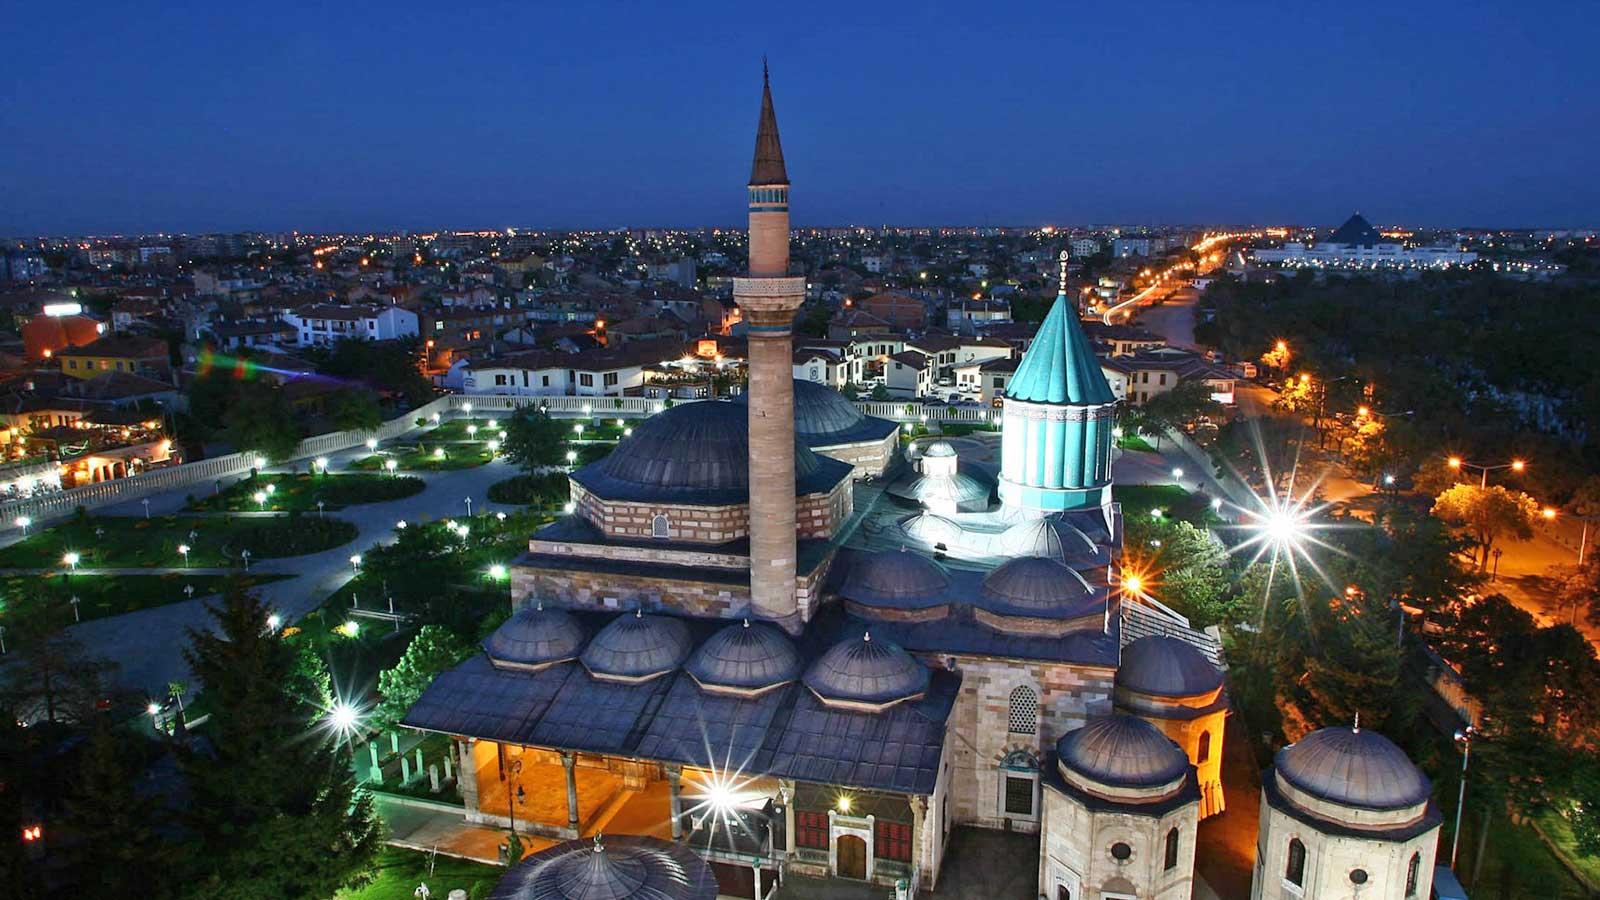 places visit konya turkey - راهنمای سفر به قونیه ، شهر عشق و عرفان | Konya